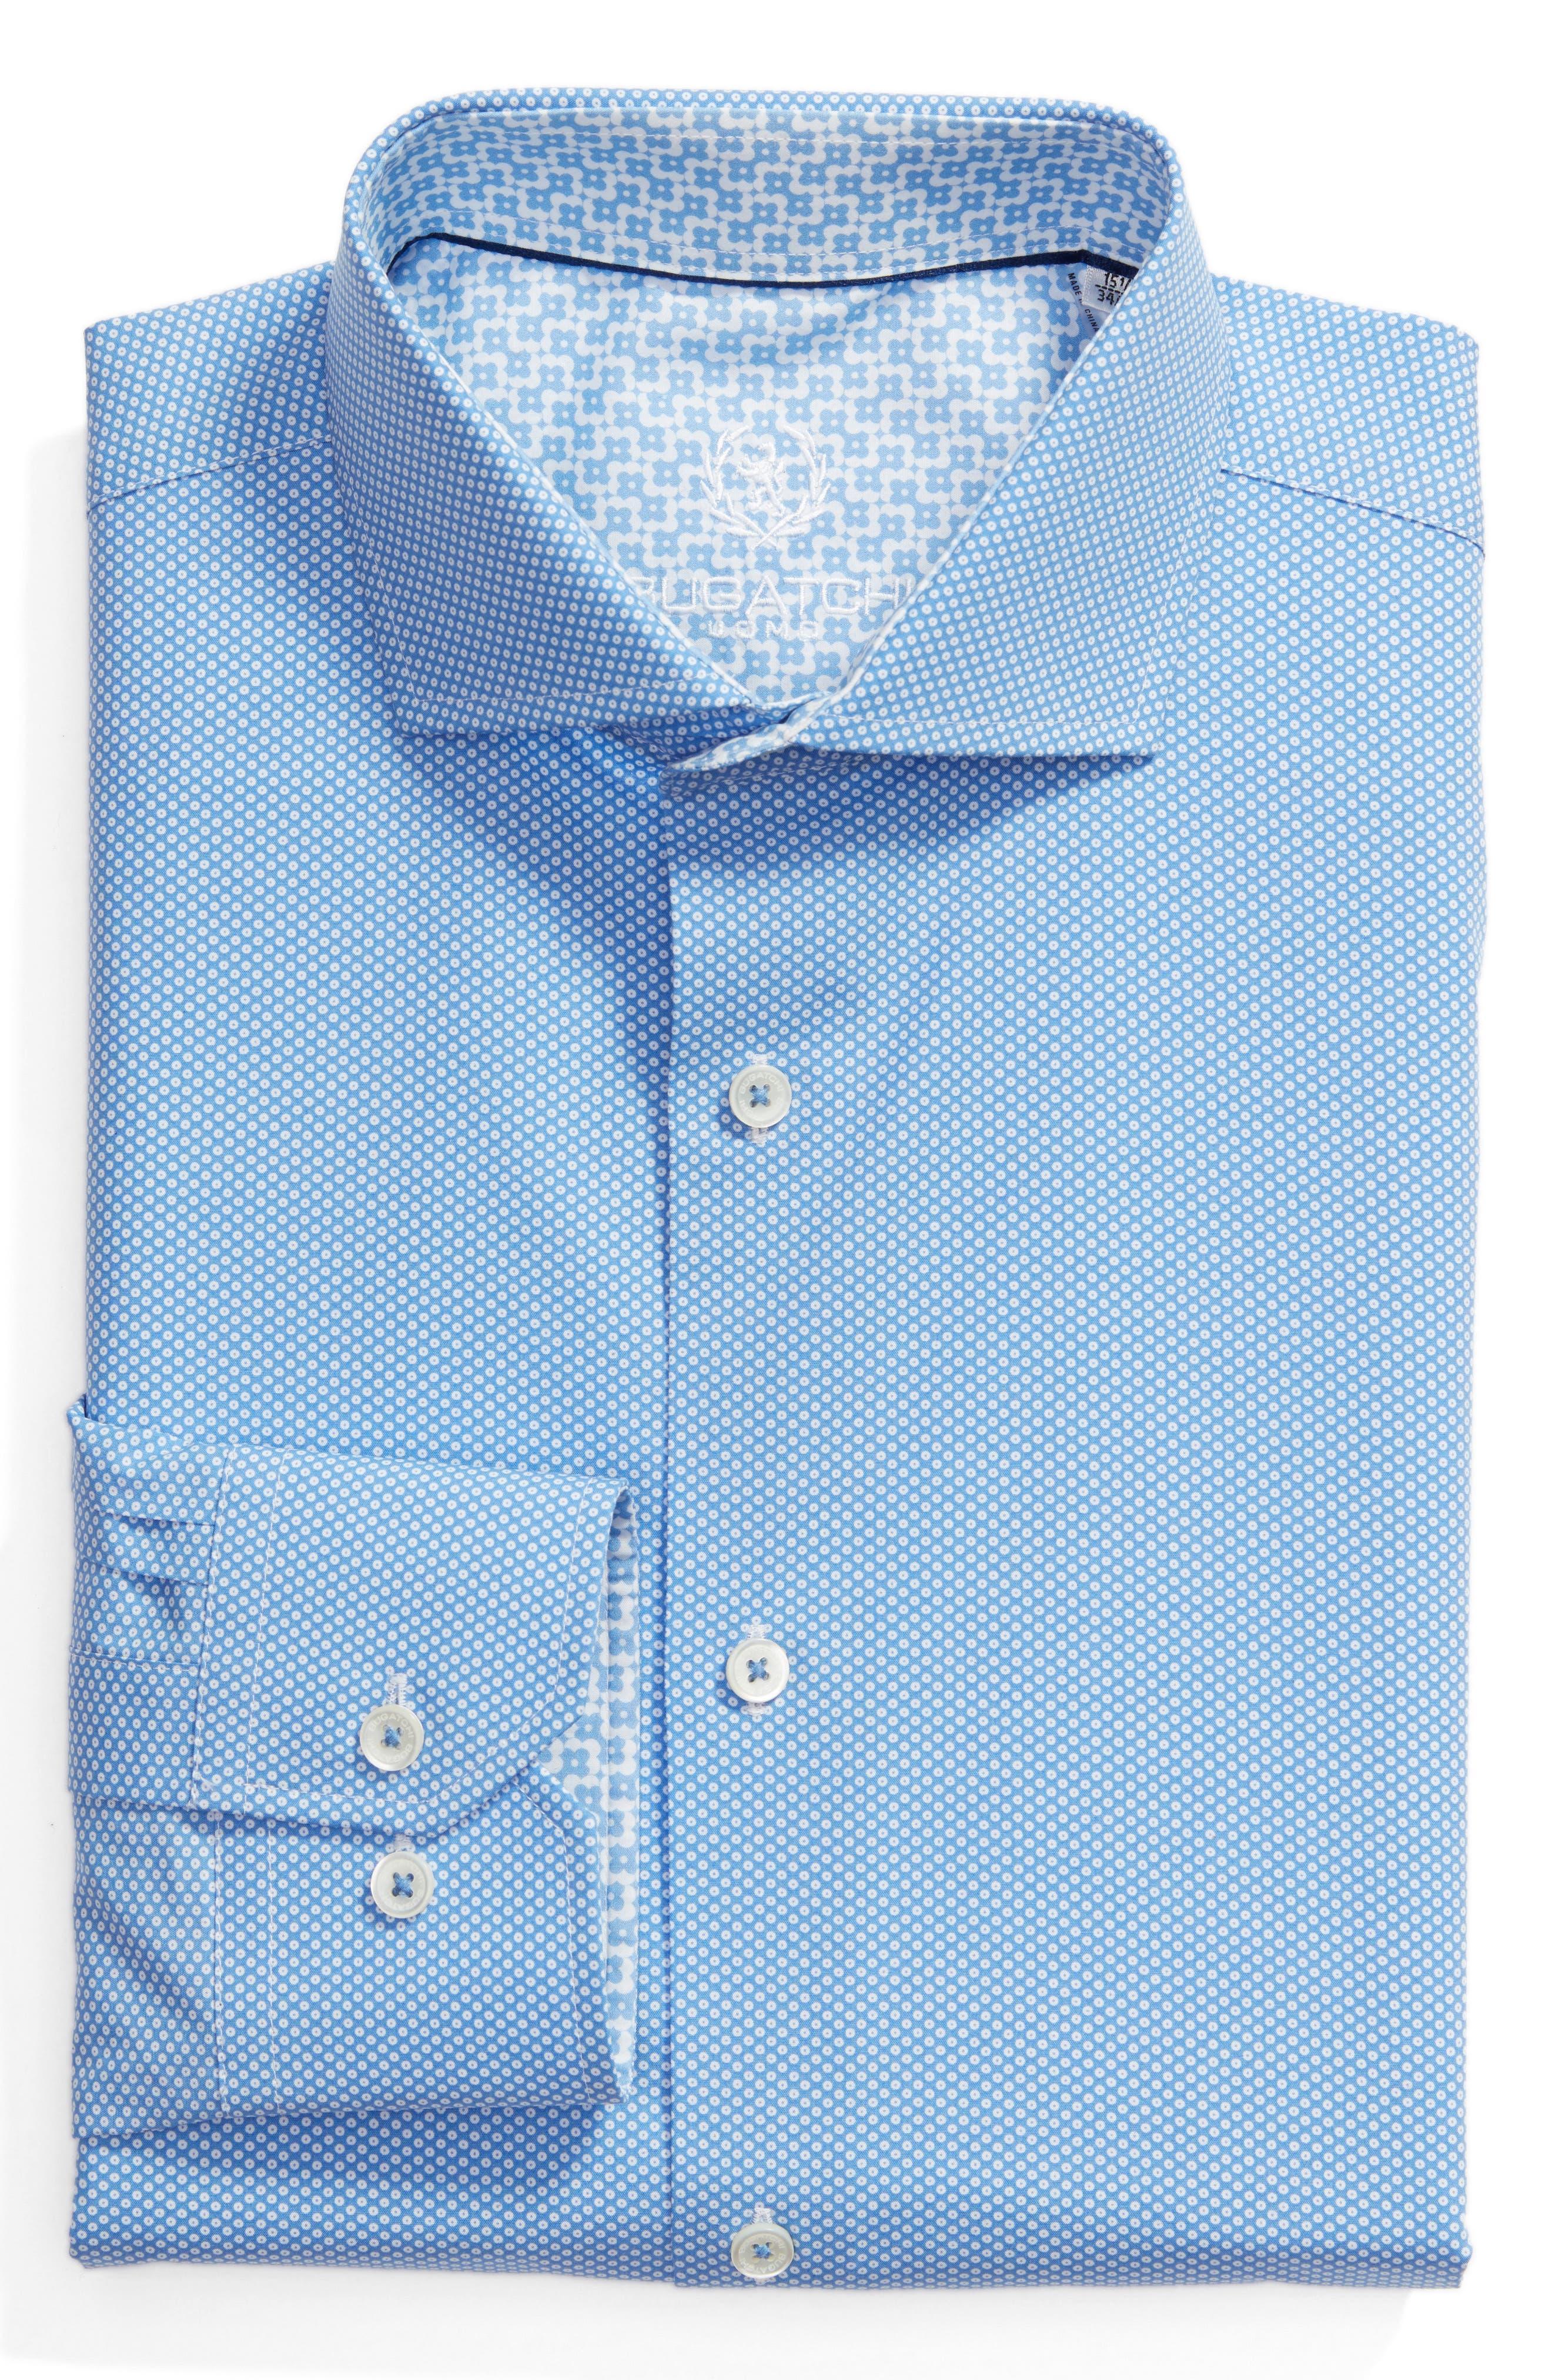 Main Image - Bugatchi Trim Fit Print Dress Shirt